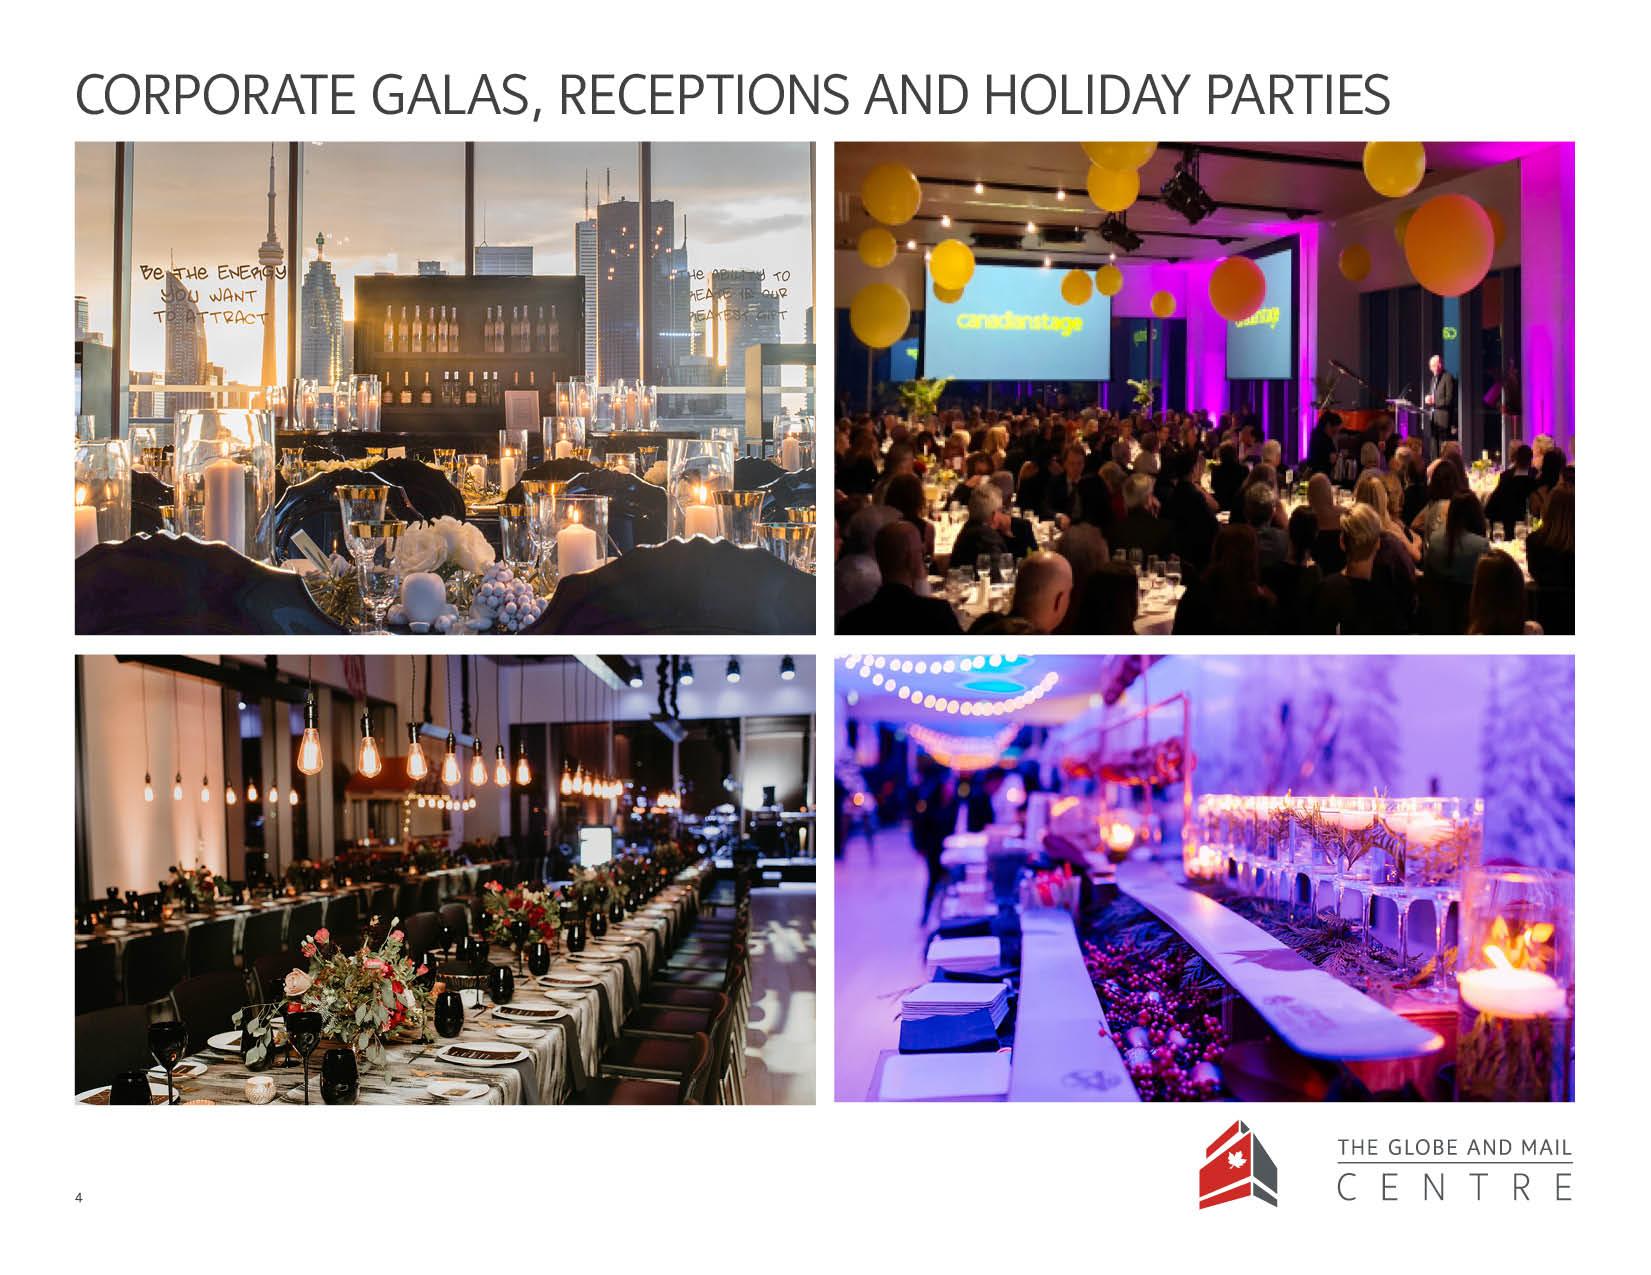 2019-09-01 GAMC Corporate Events4.jpg